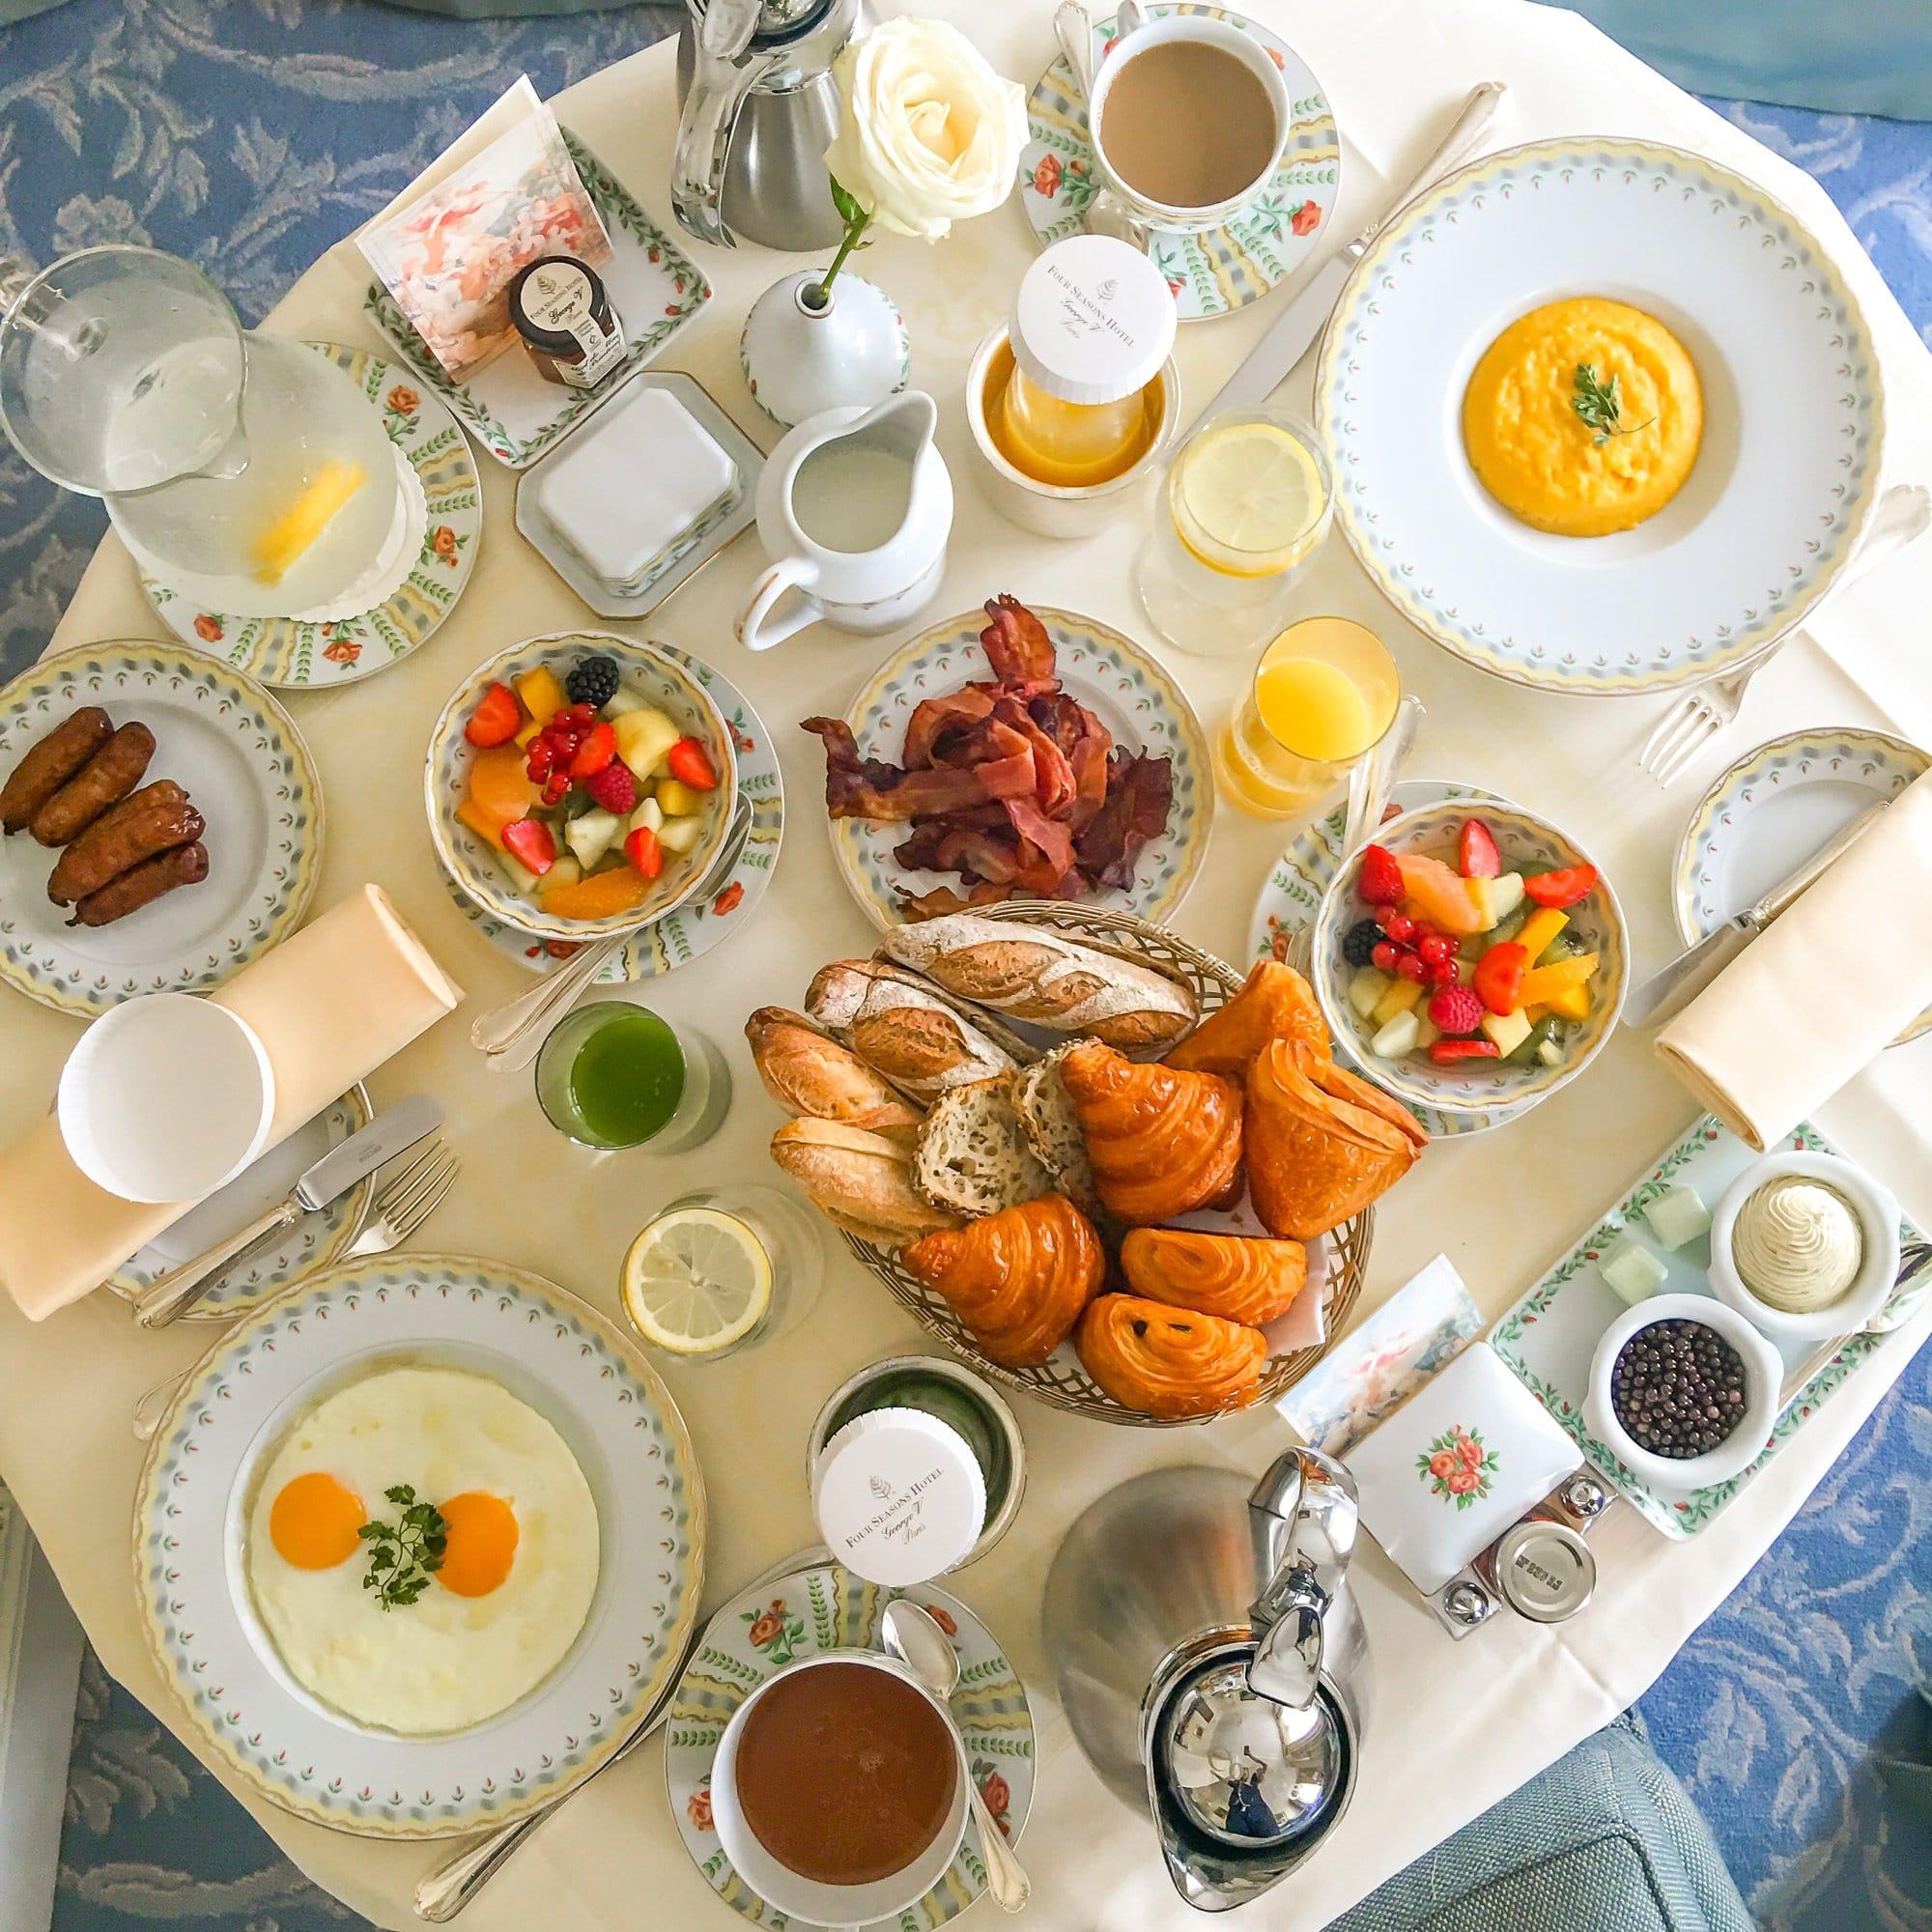 Breakfast at Four Seasons Hotel George V, Paris